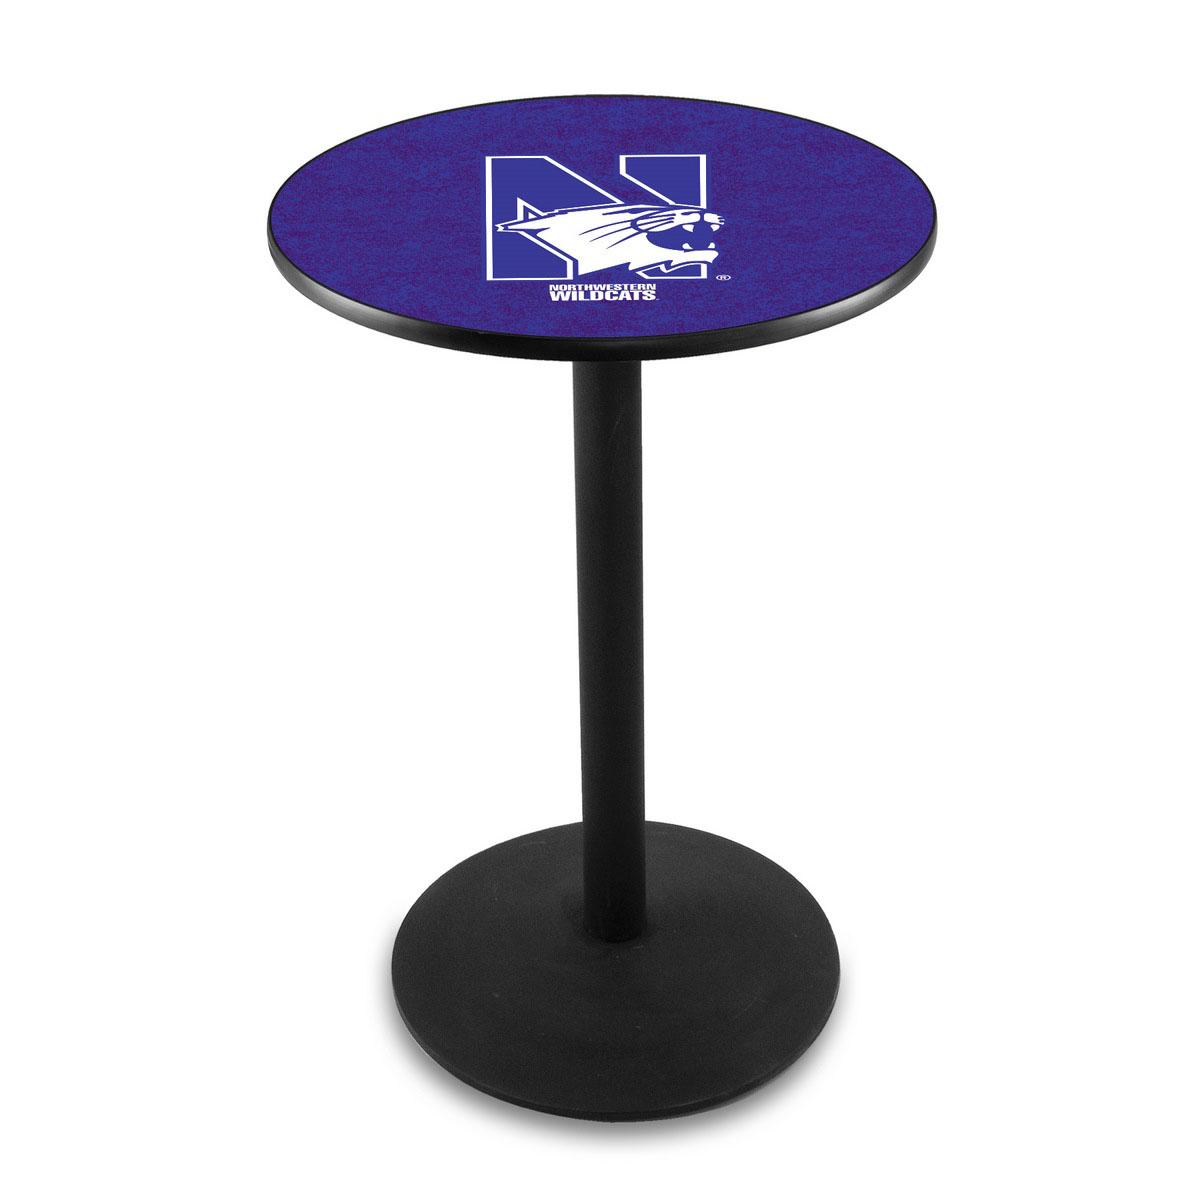 Lovable Northwestern University Logo Pub Bar Table Round Stand Product Photo